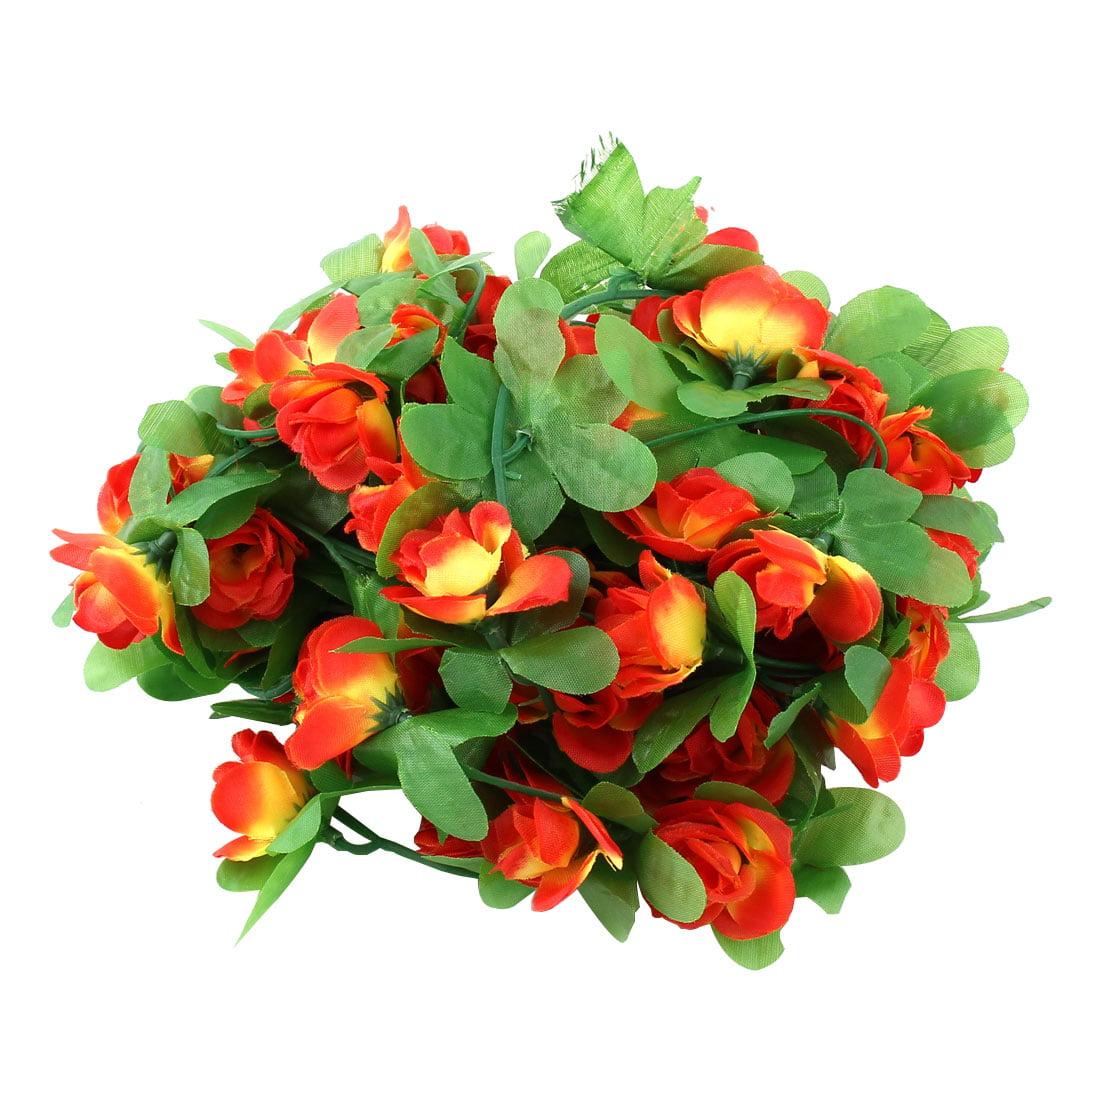 Wedding Plastic Artificial Flower Hanging Wall Basket Wedding Party Garden Wall Decoration Ivy Vine 2pcs